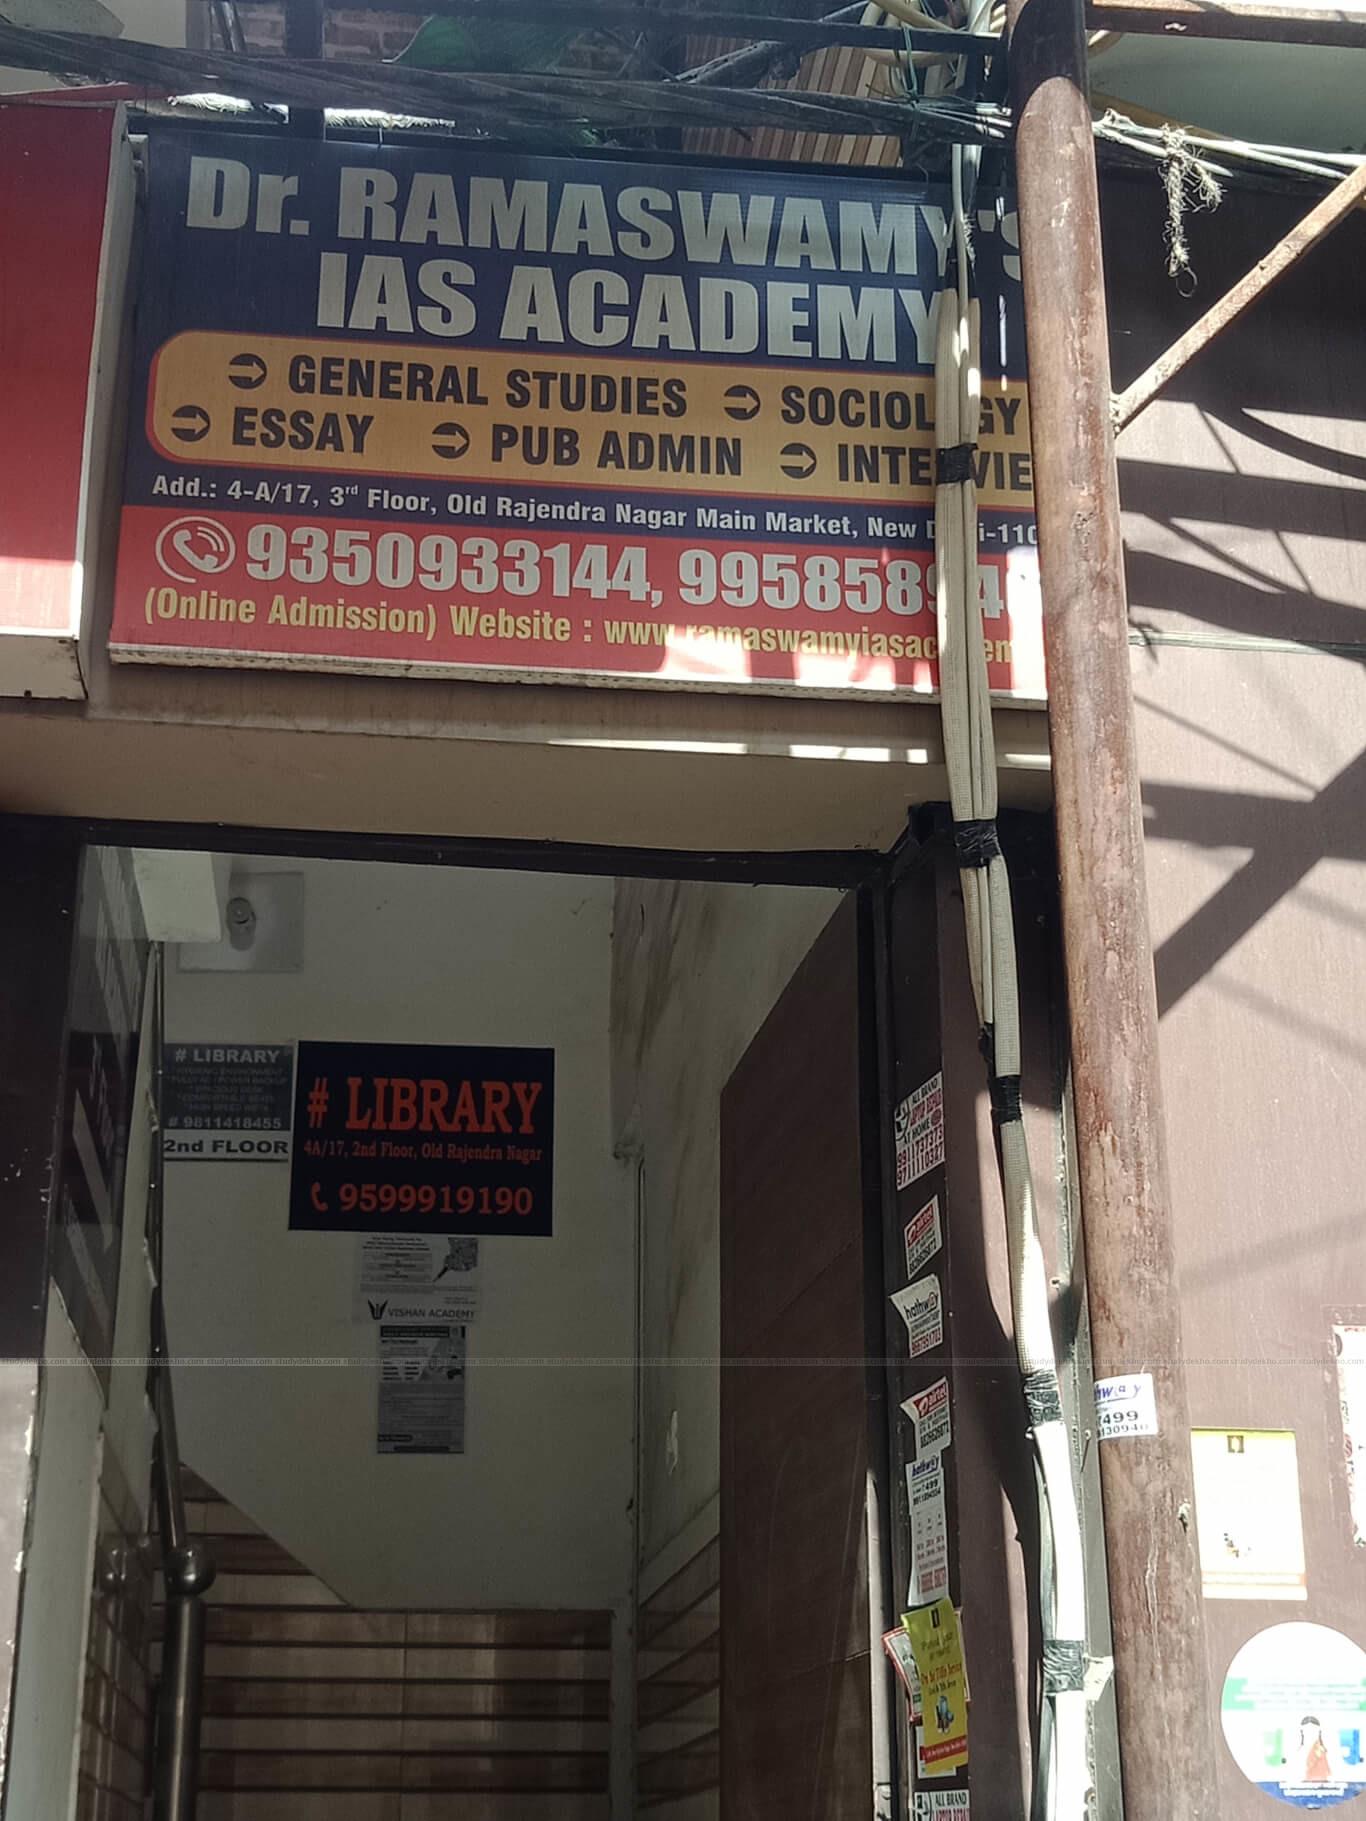 DR. RAMASWAY'S IAS ACADEMY Logo